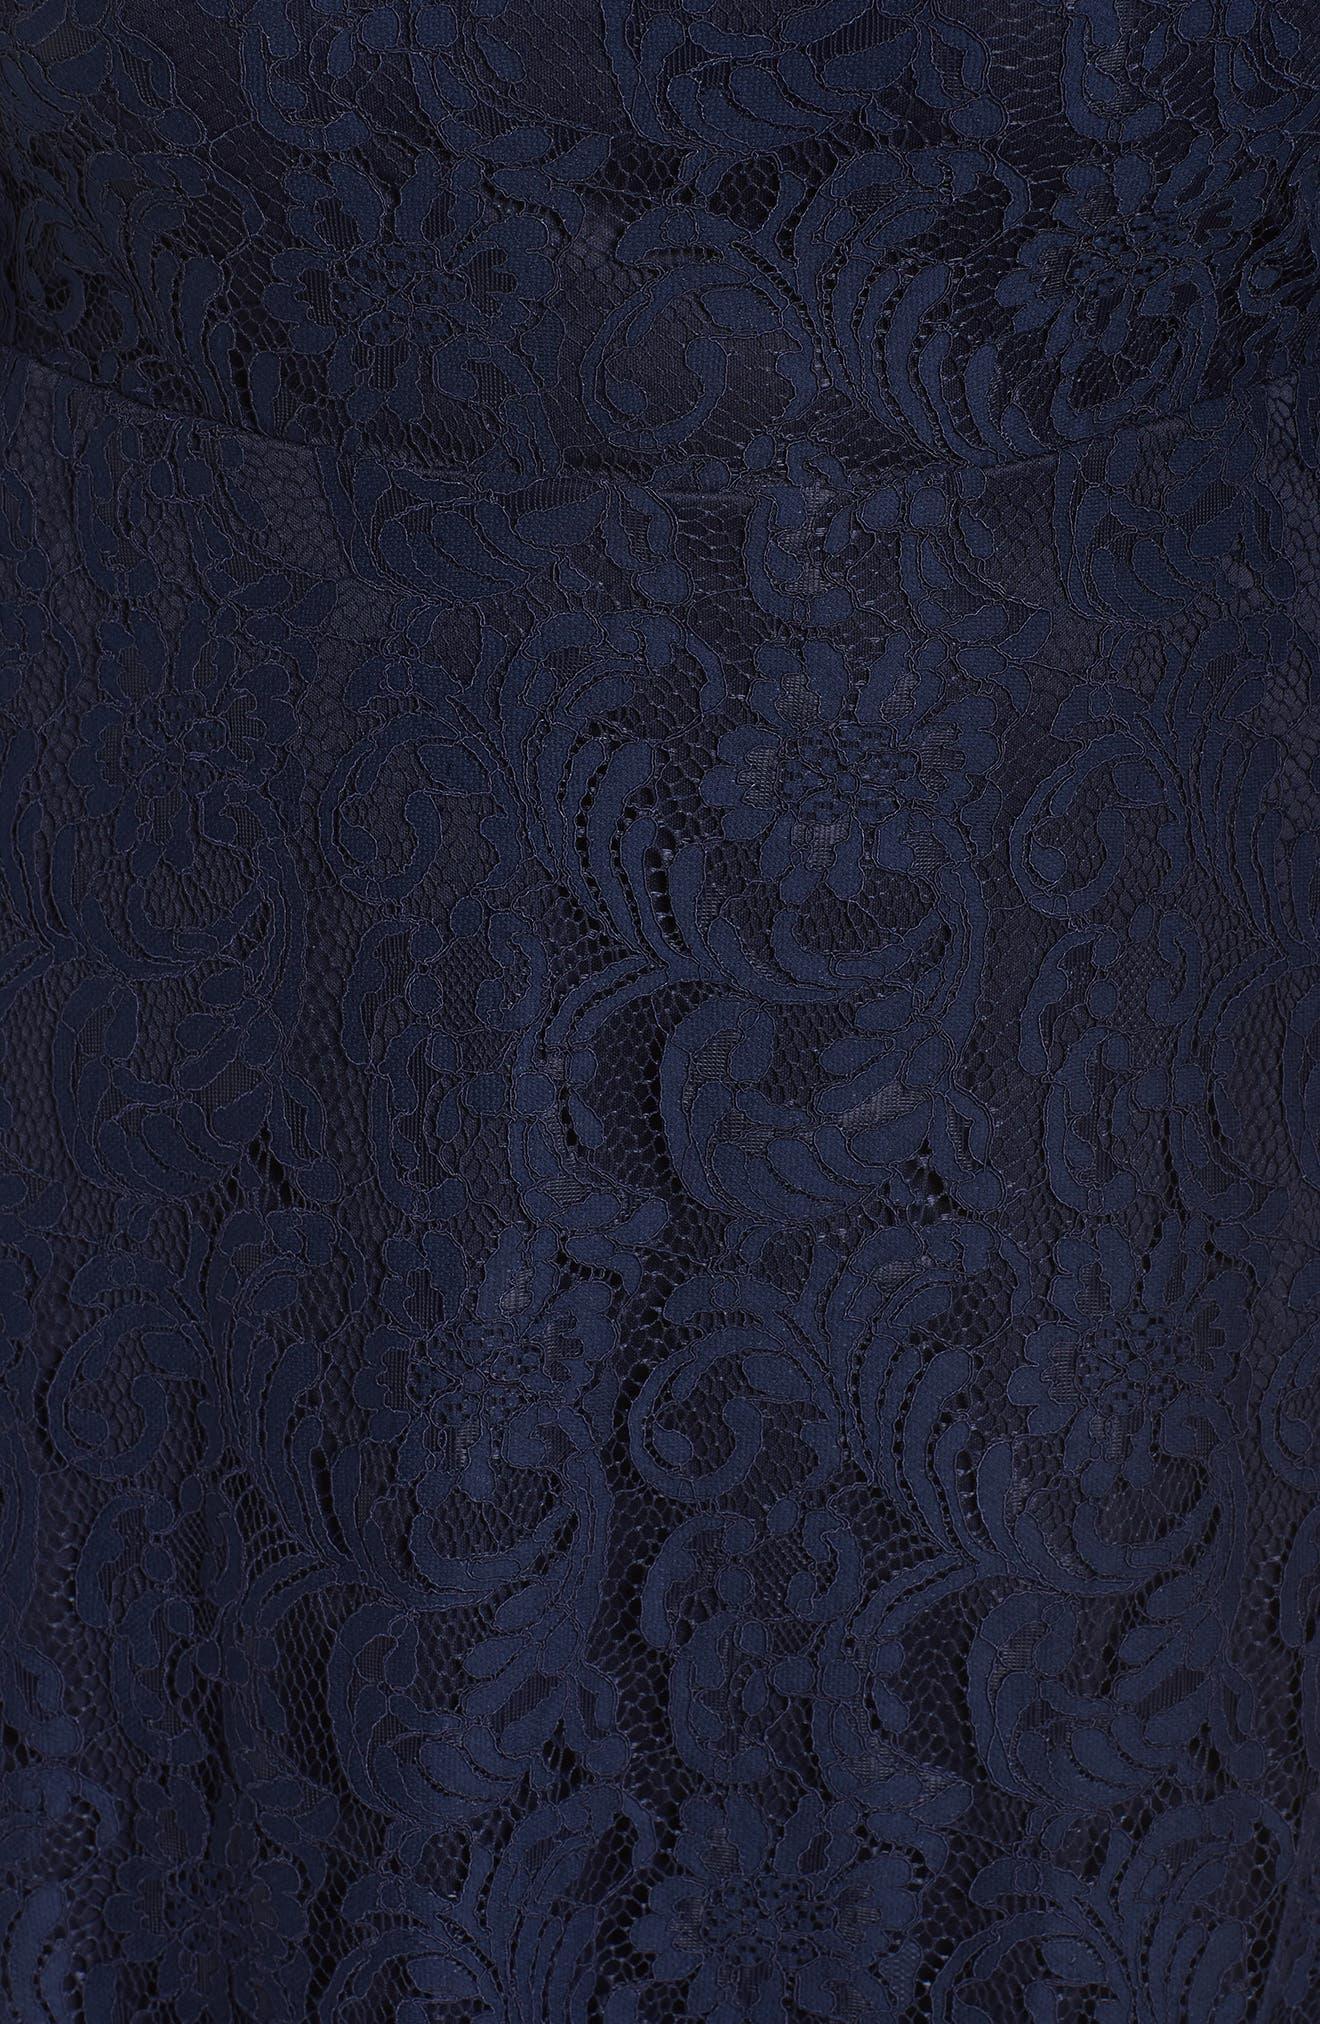 Fit & Flare Lace Dress,                             Alternate thumbnail 5, color,                             400